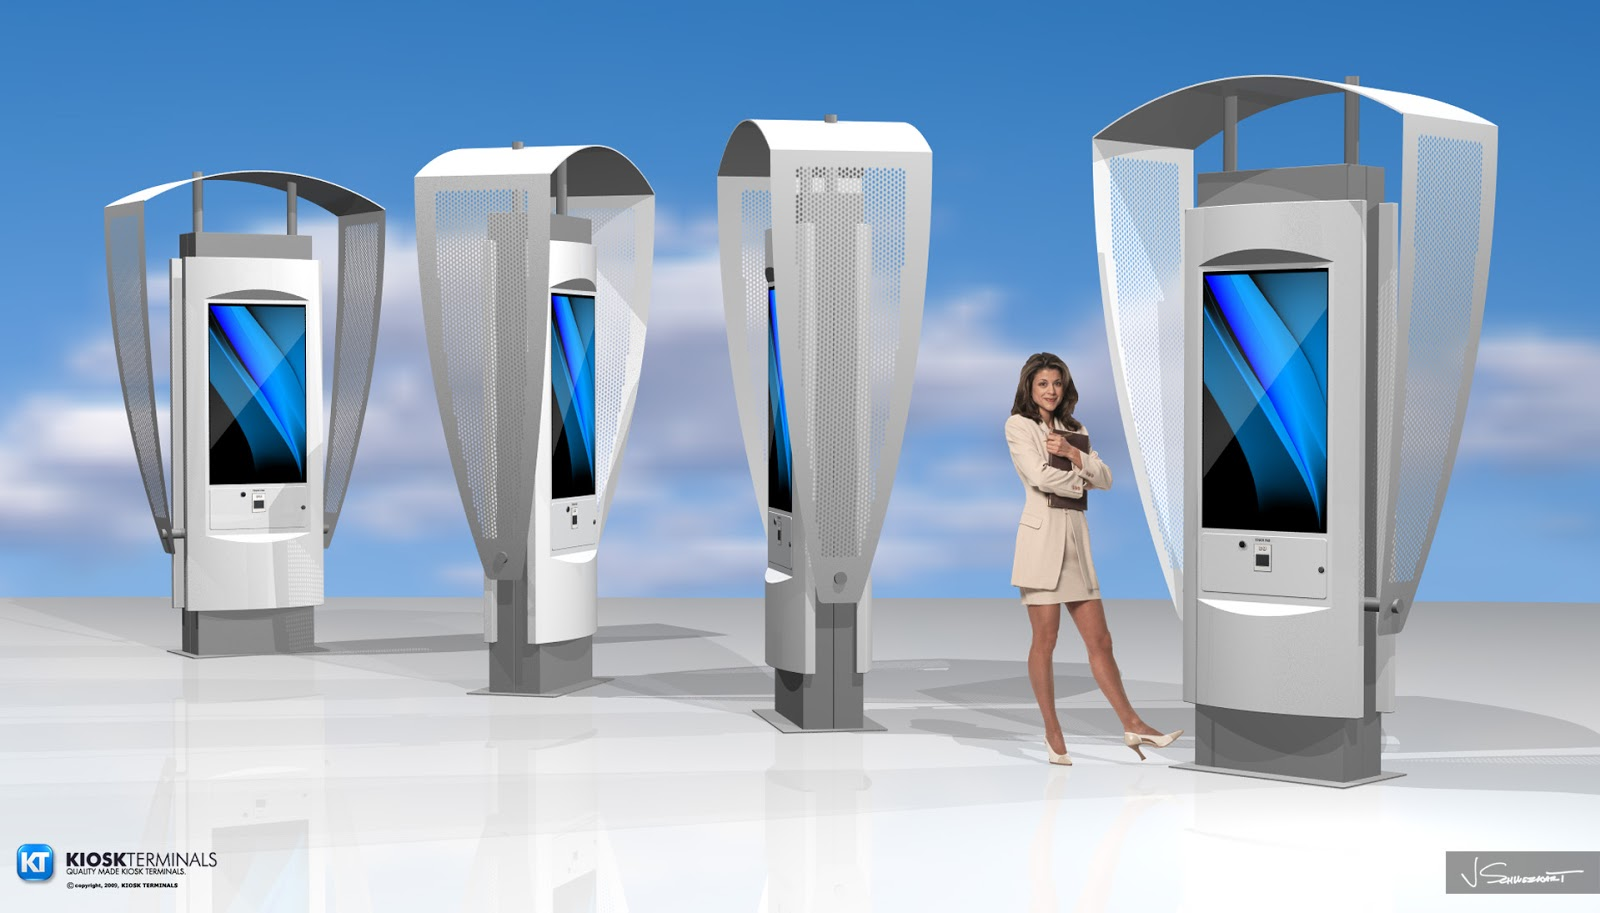 Self service kiosks and digital signage digital signage for Exterior kiosk design